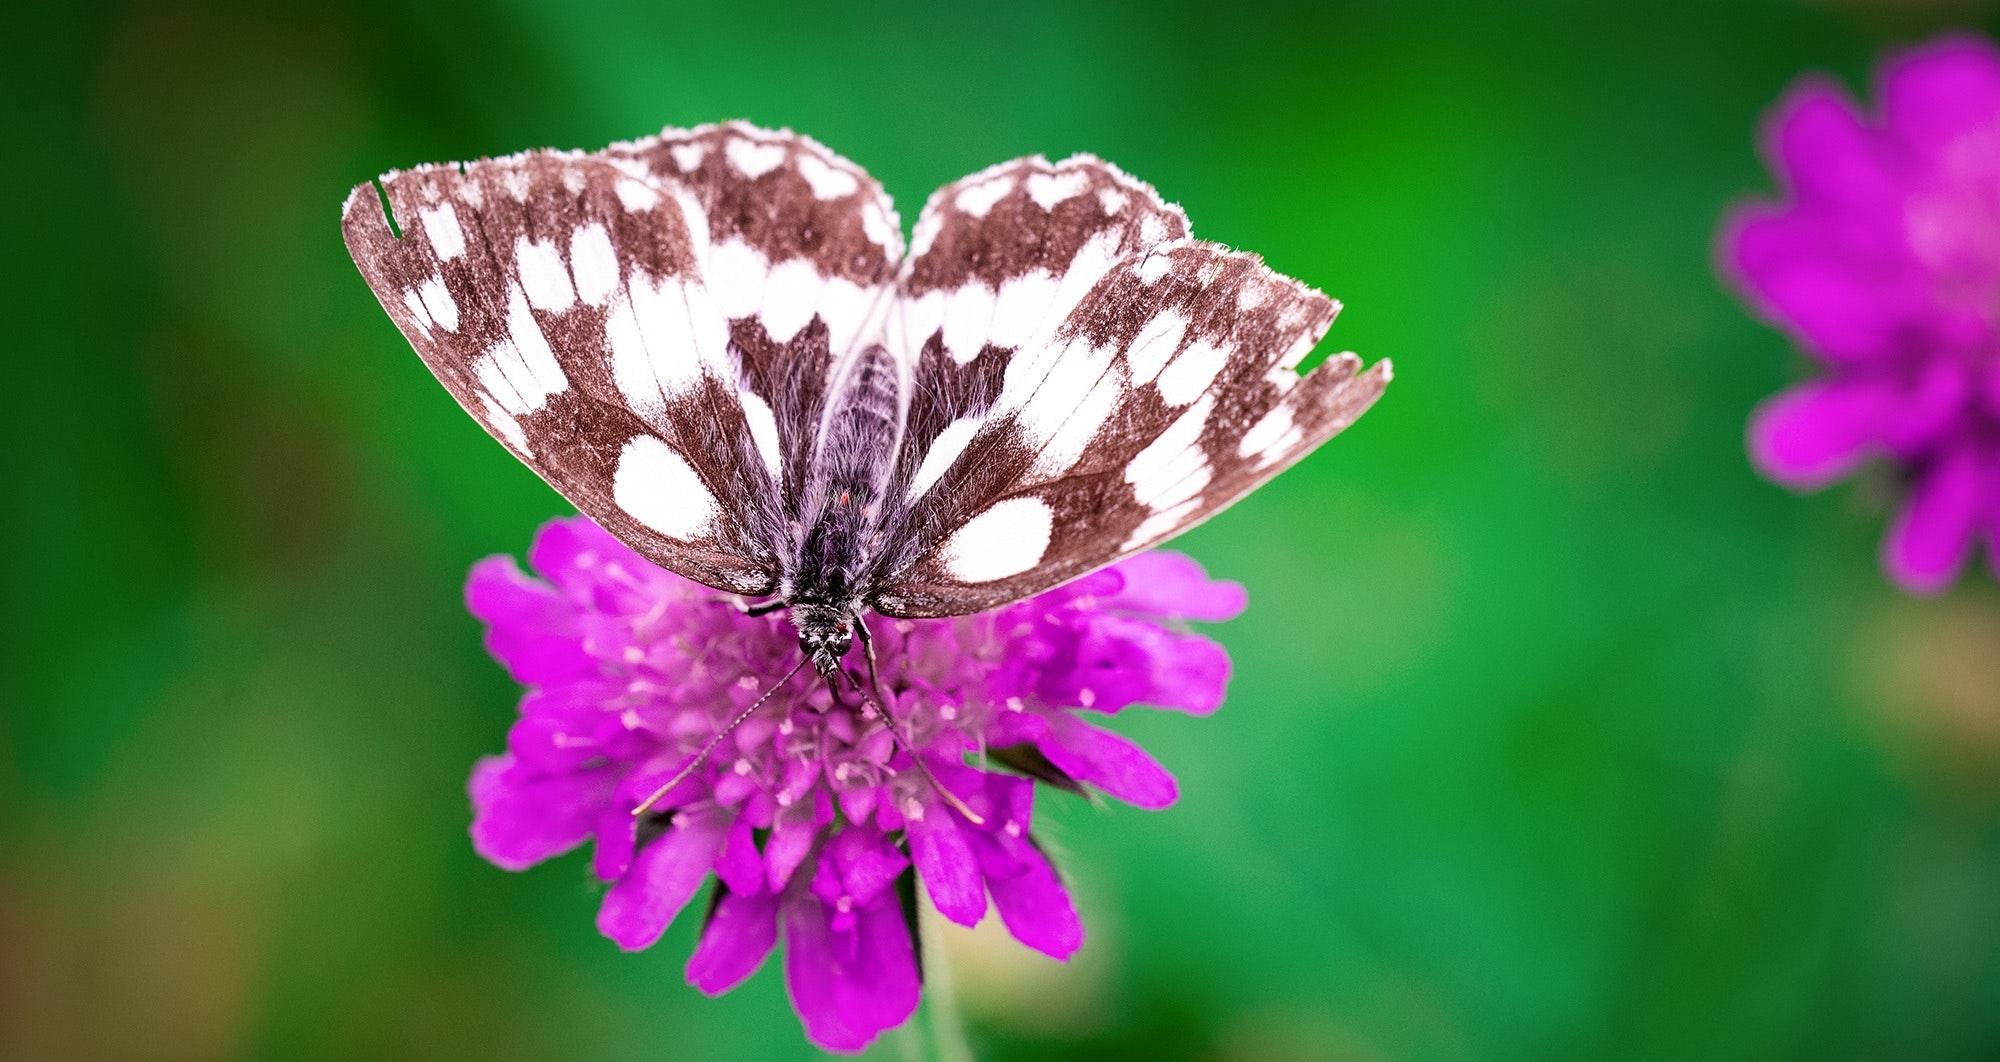 bloom-blossom-butterfly-162229.jpg